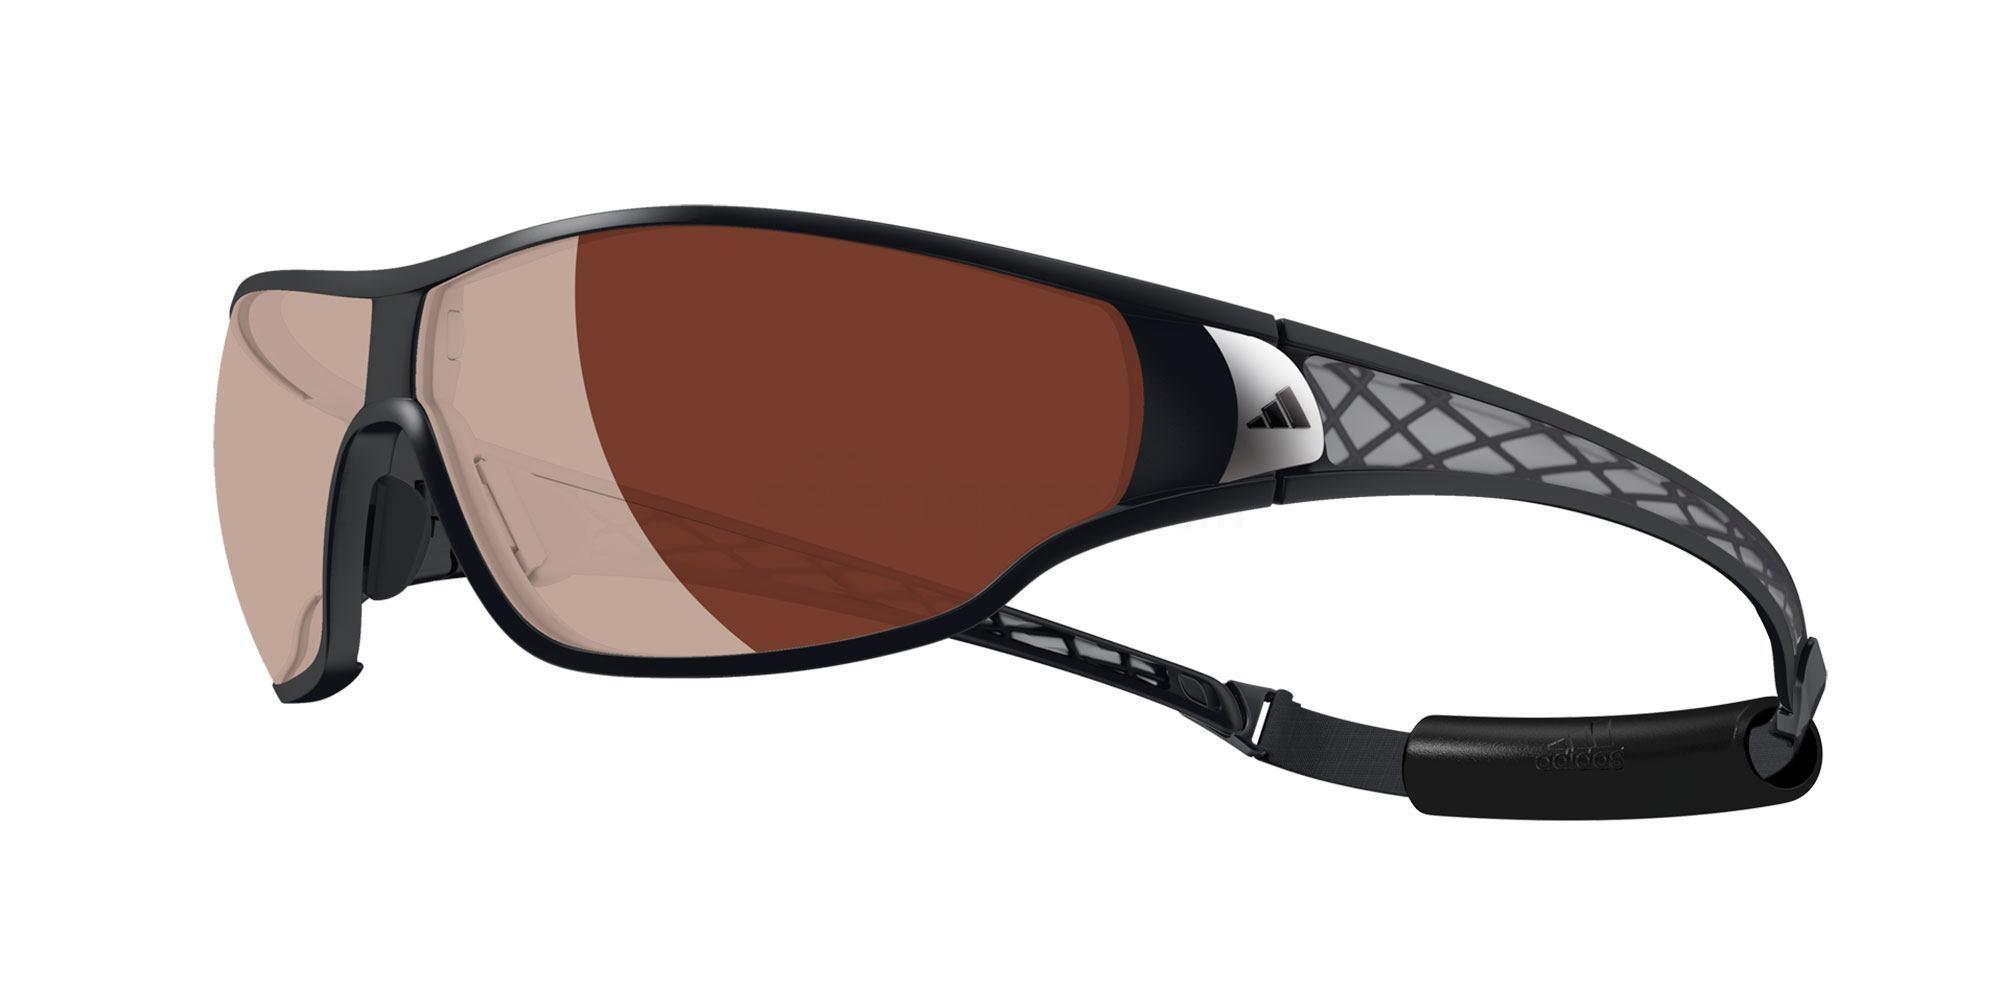 a189/00 6050 a189 Tycane Pro Polarized Sunglasses, Adidas